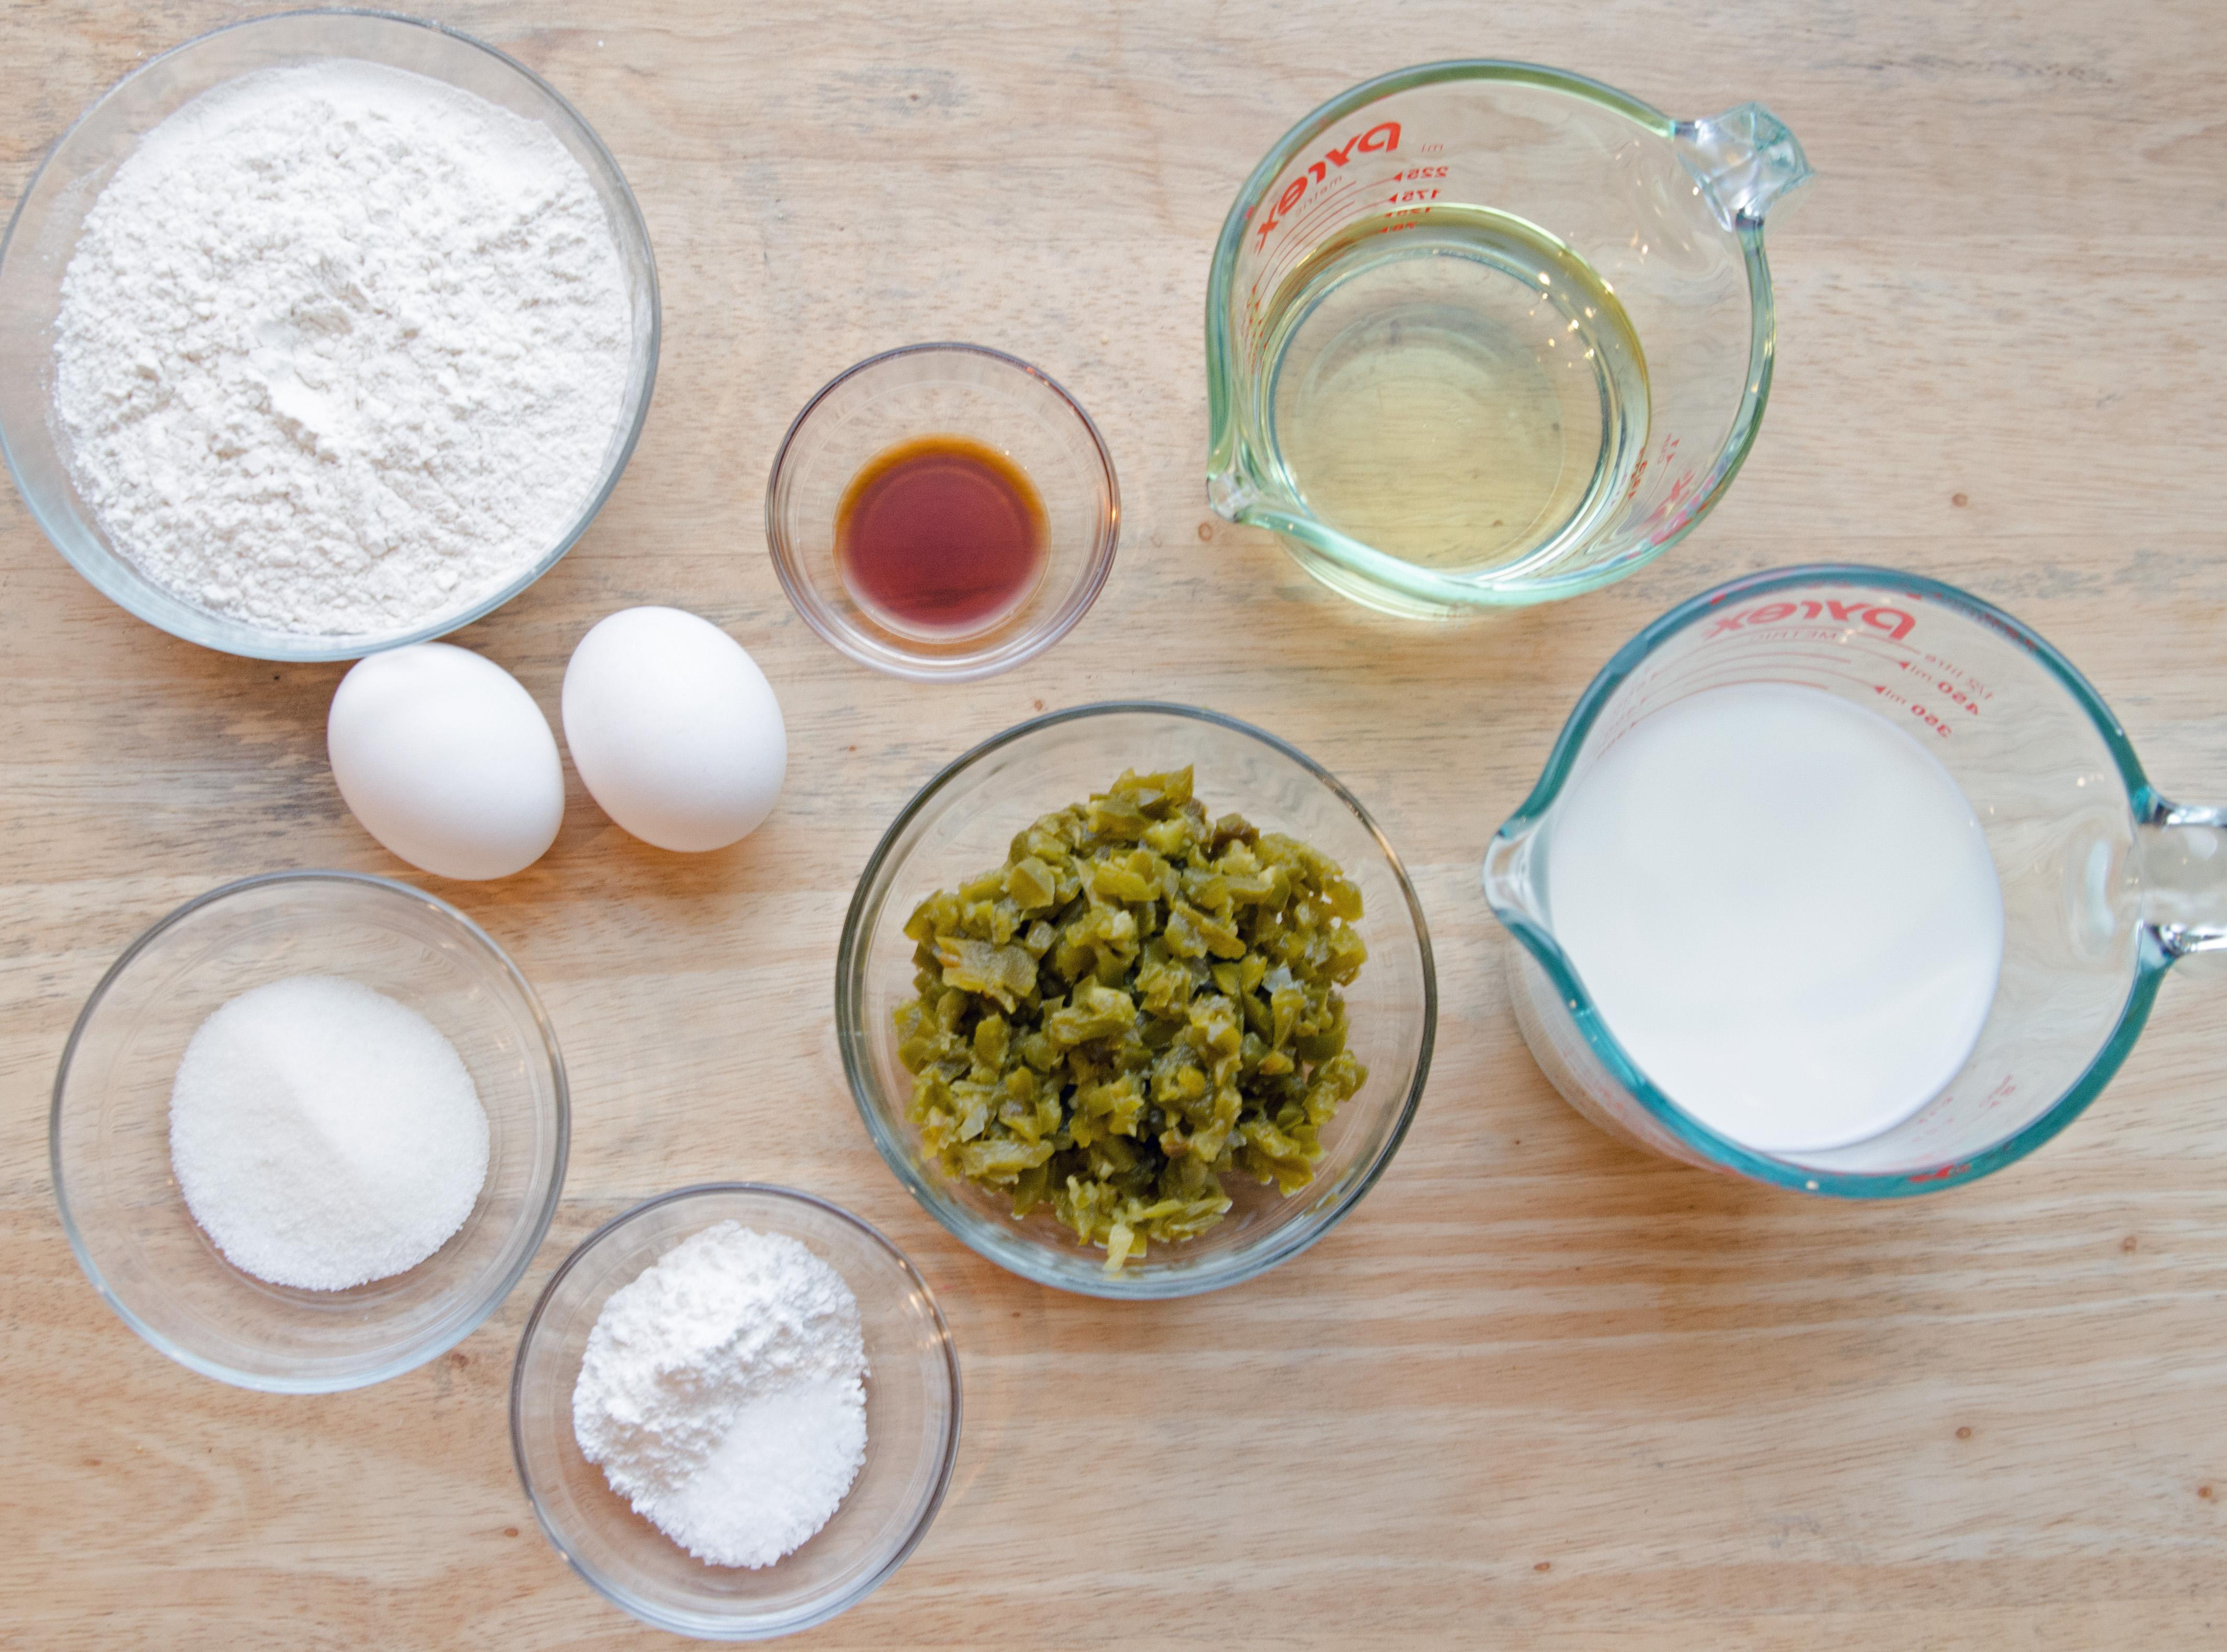 Ingredients for Honey Jalapeño Waffles